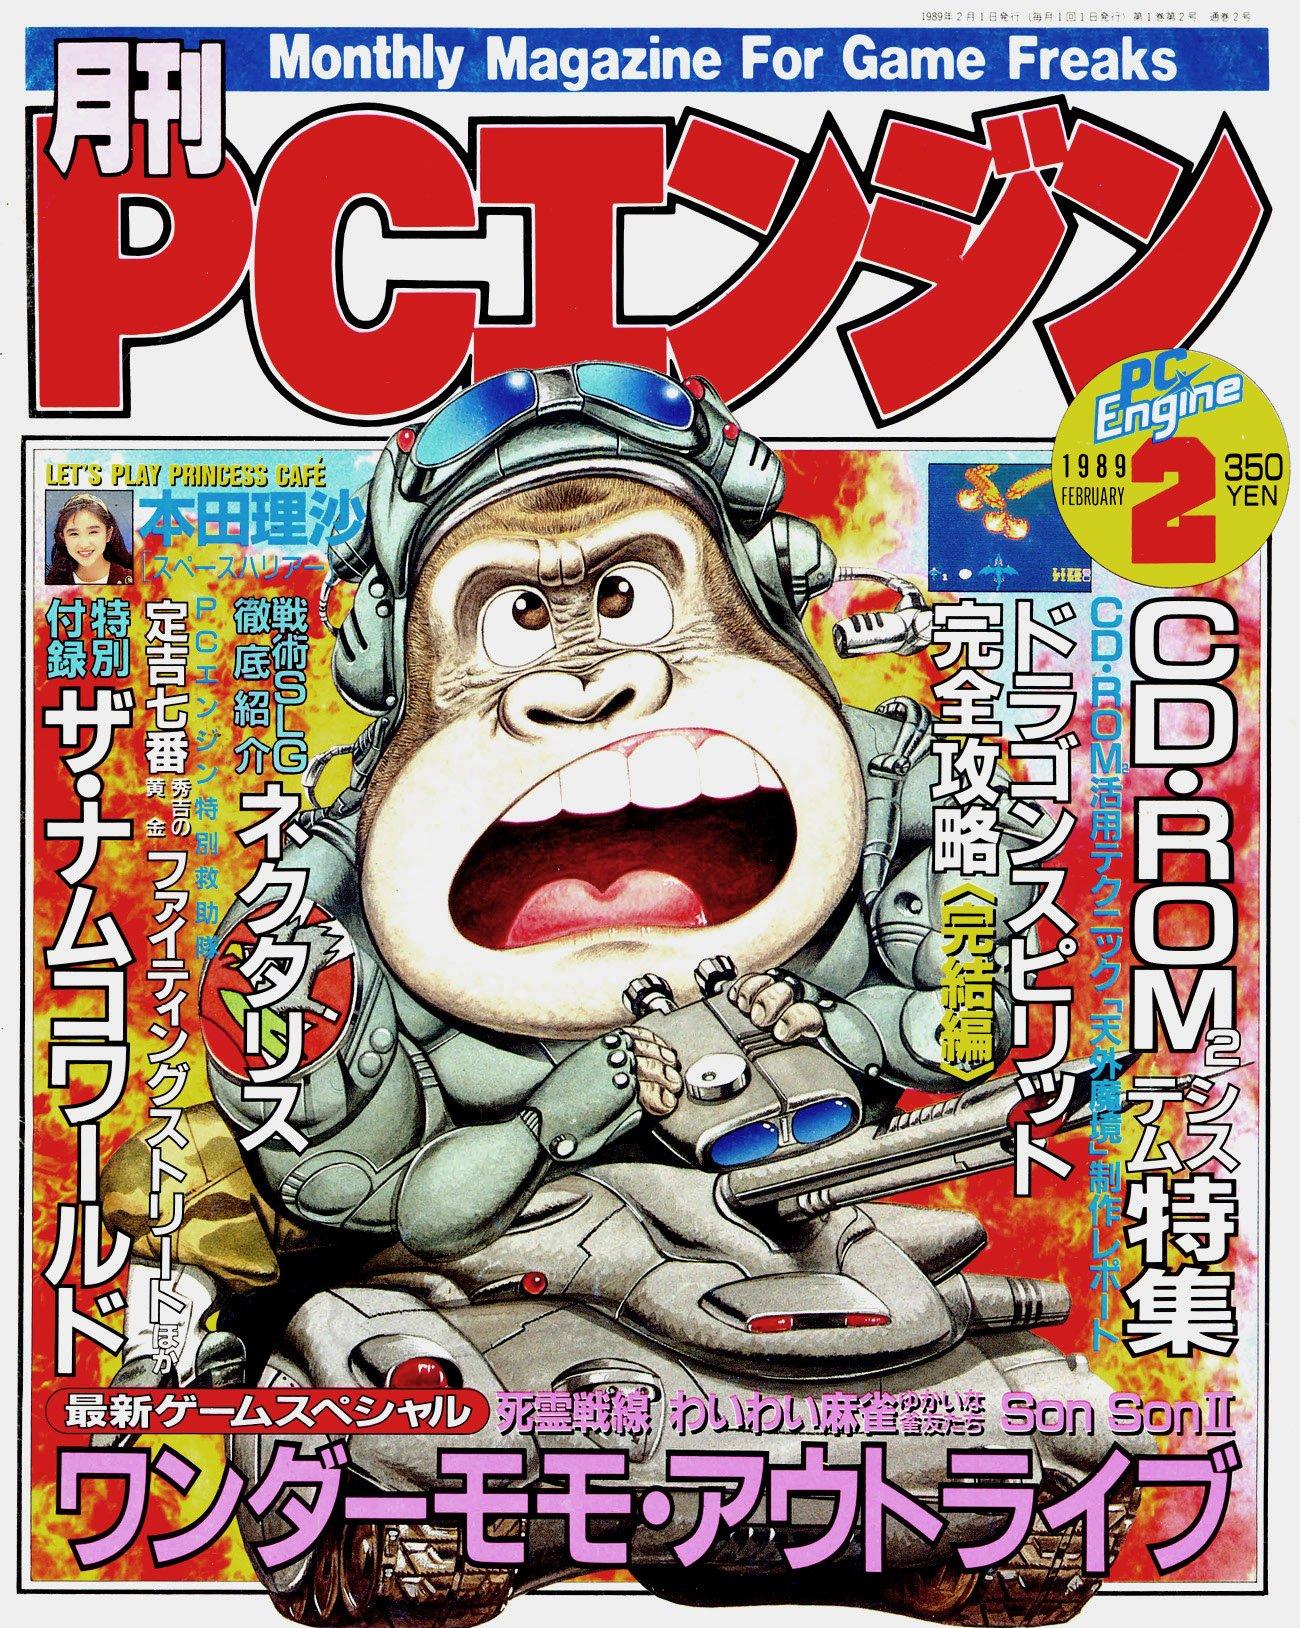 Gekkan PC Engine Issue 02 (February 1989)